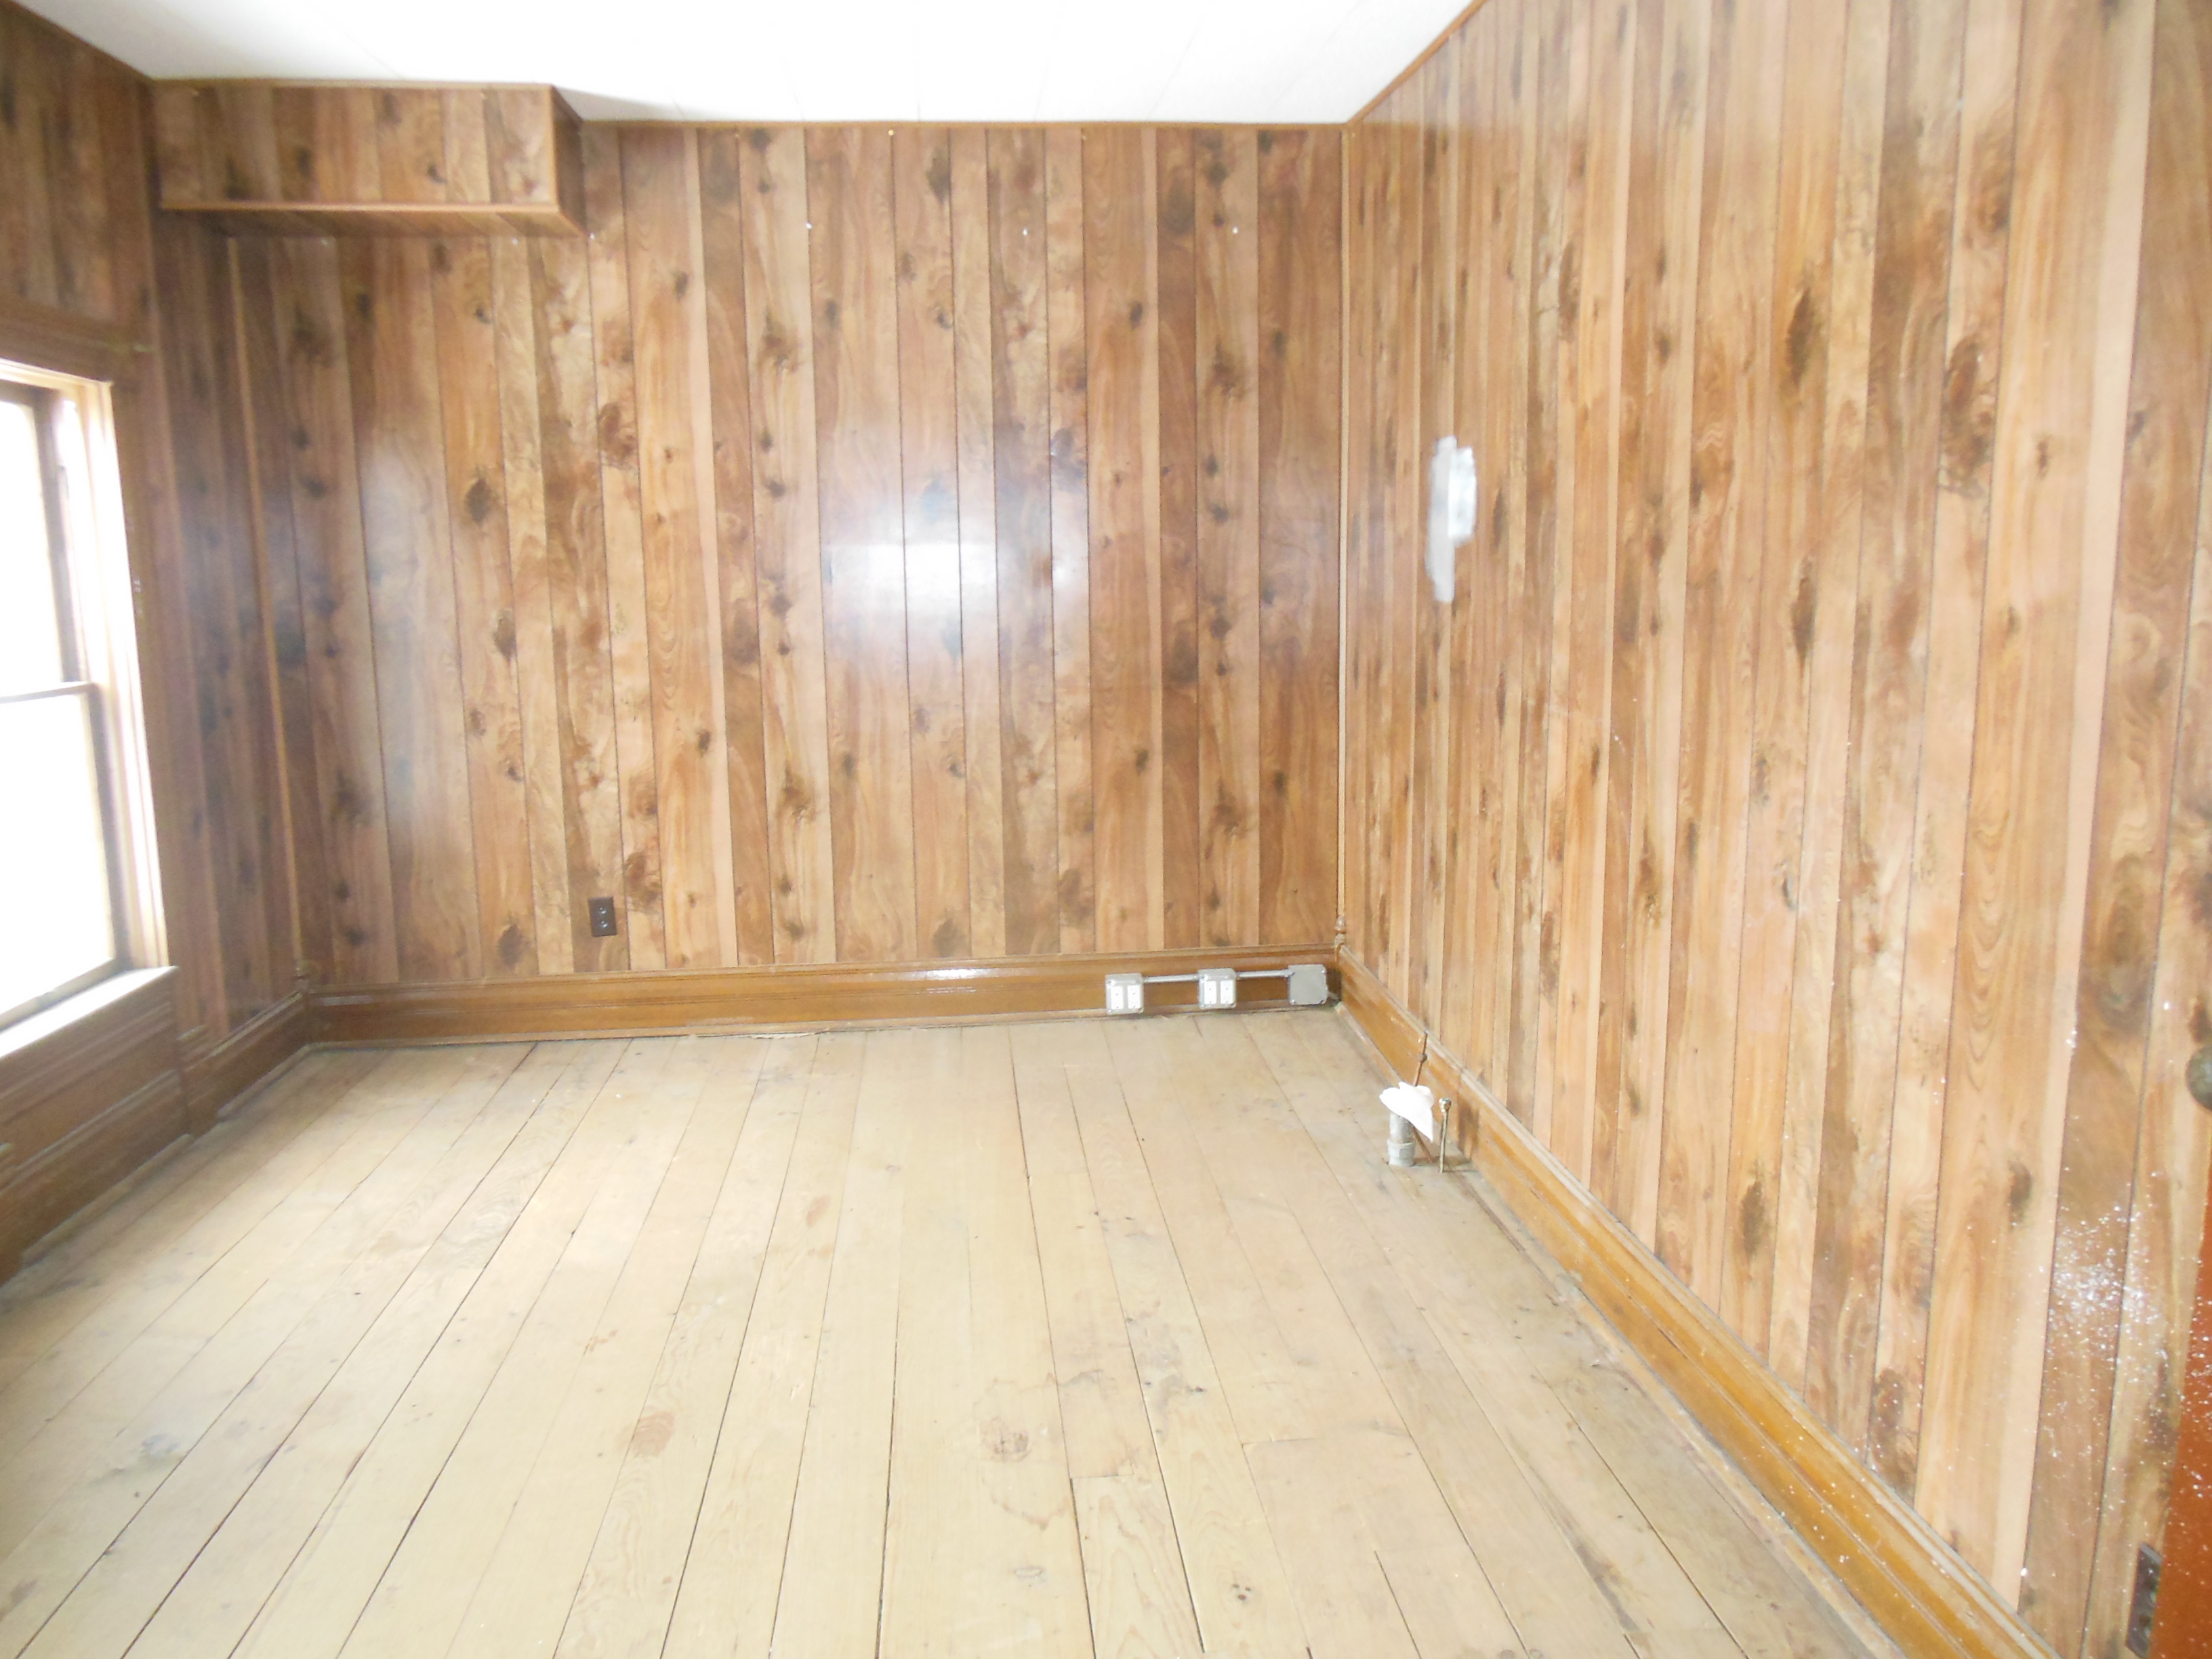 509 Normal, Upstairs room